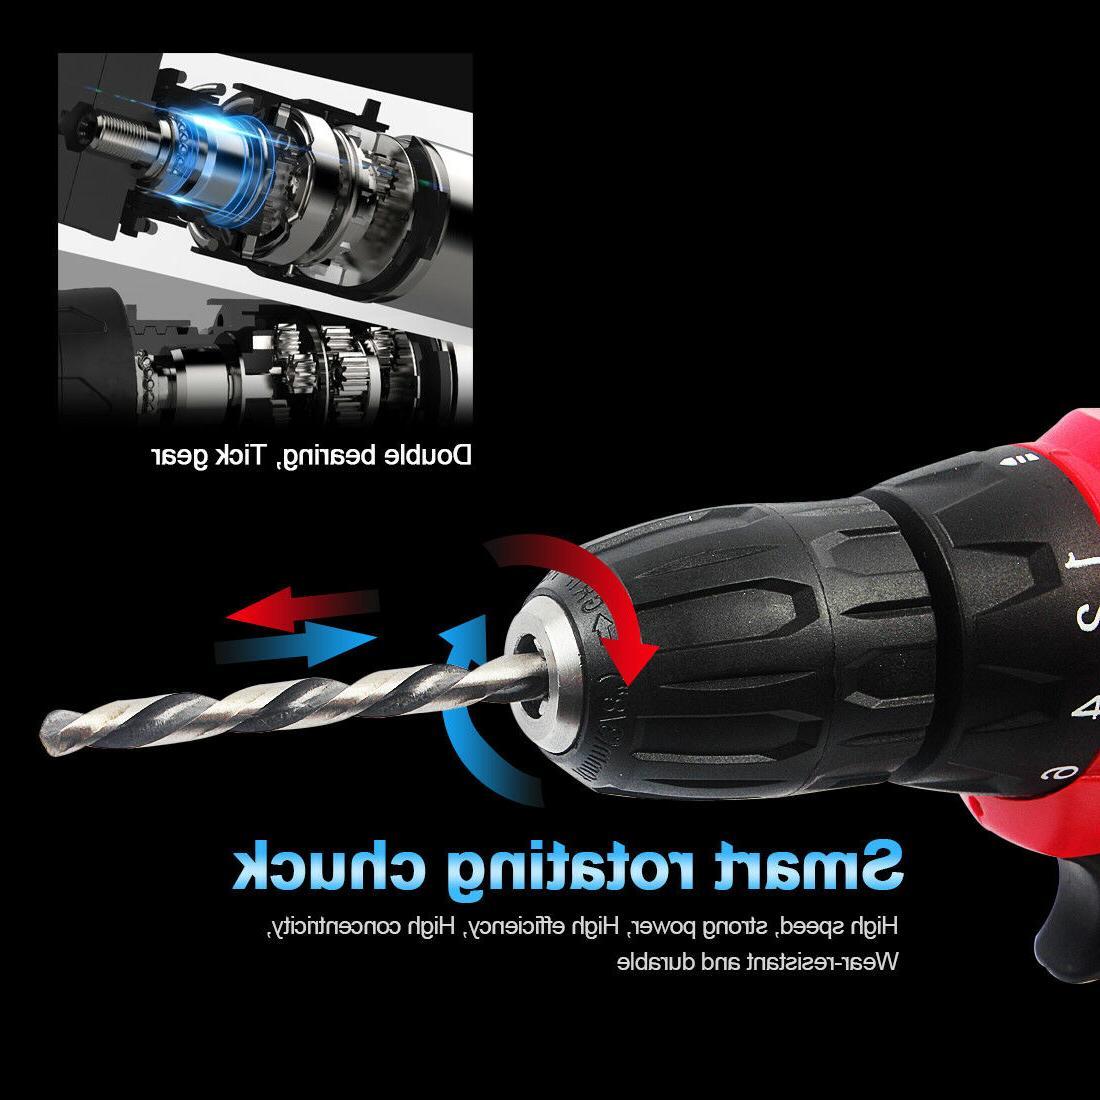 Portable Drill Electric Repair Set 18v max